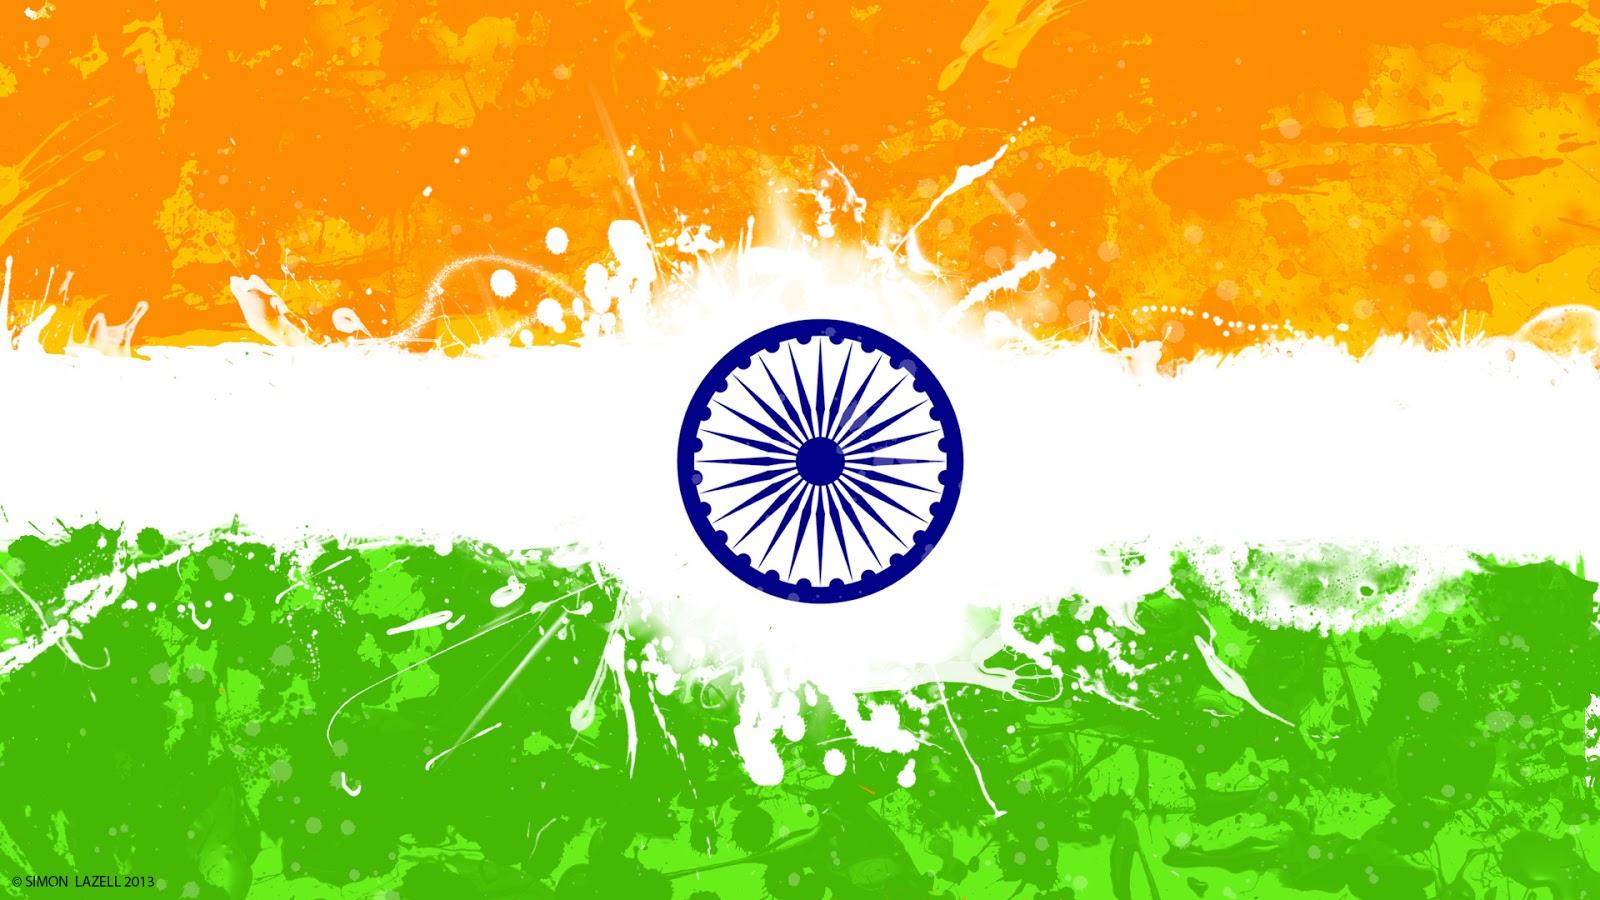 IPTV INDIAN Channel - IPTV Links | Watch IPTV For Free | Iptv Free